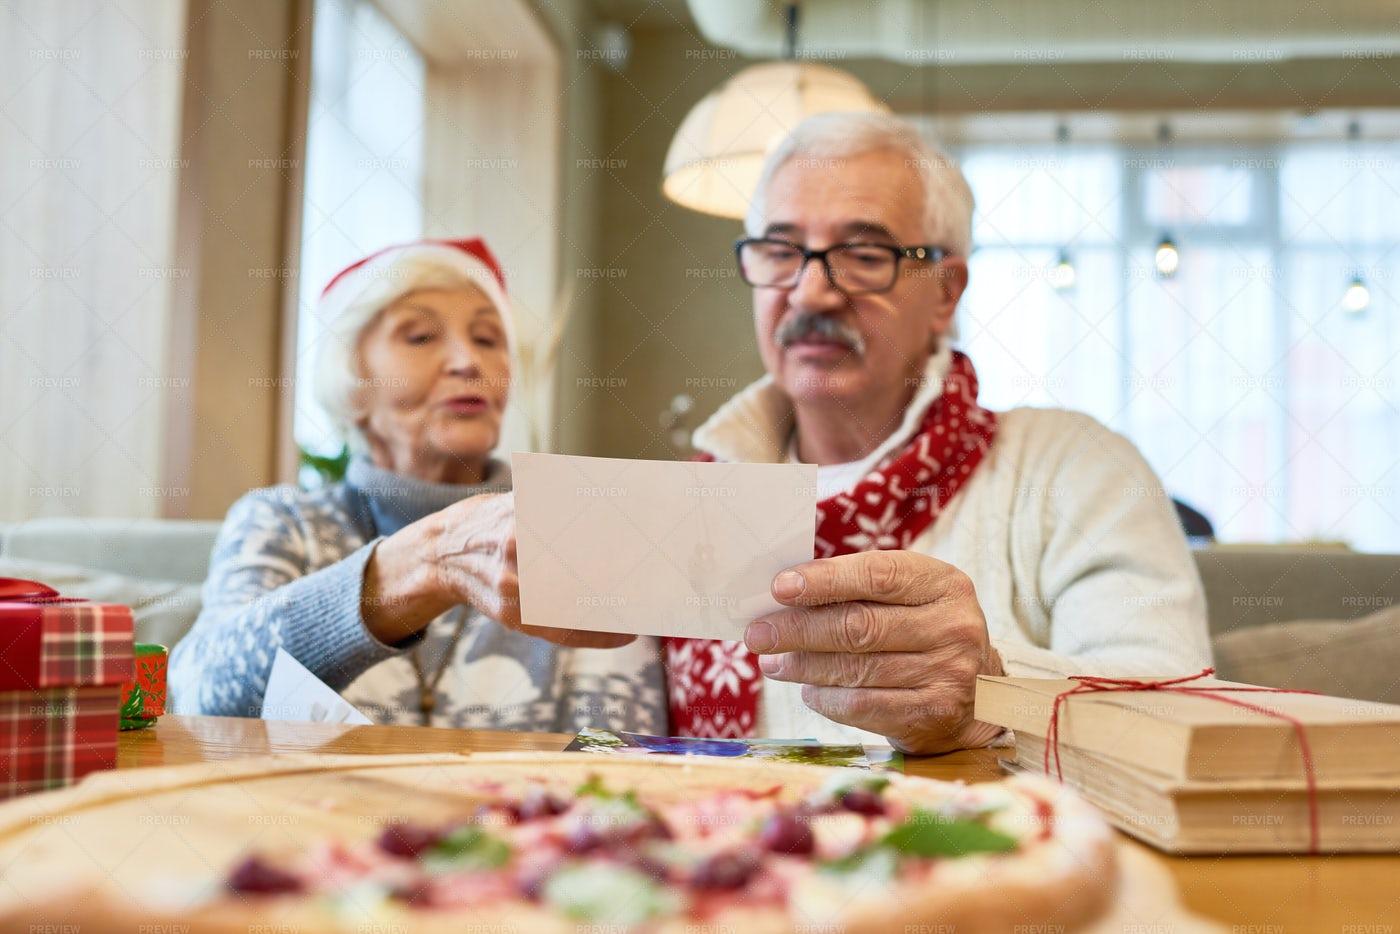 Senior Couple Looking At Family...: Stock Photos